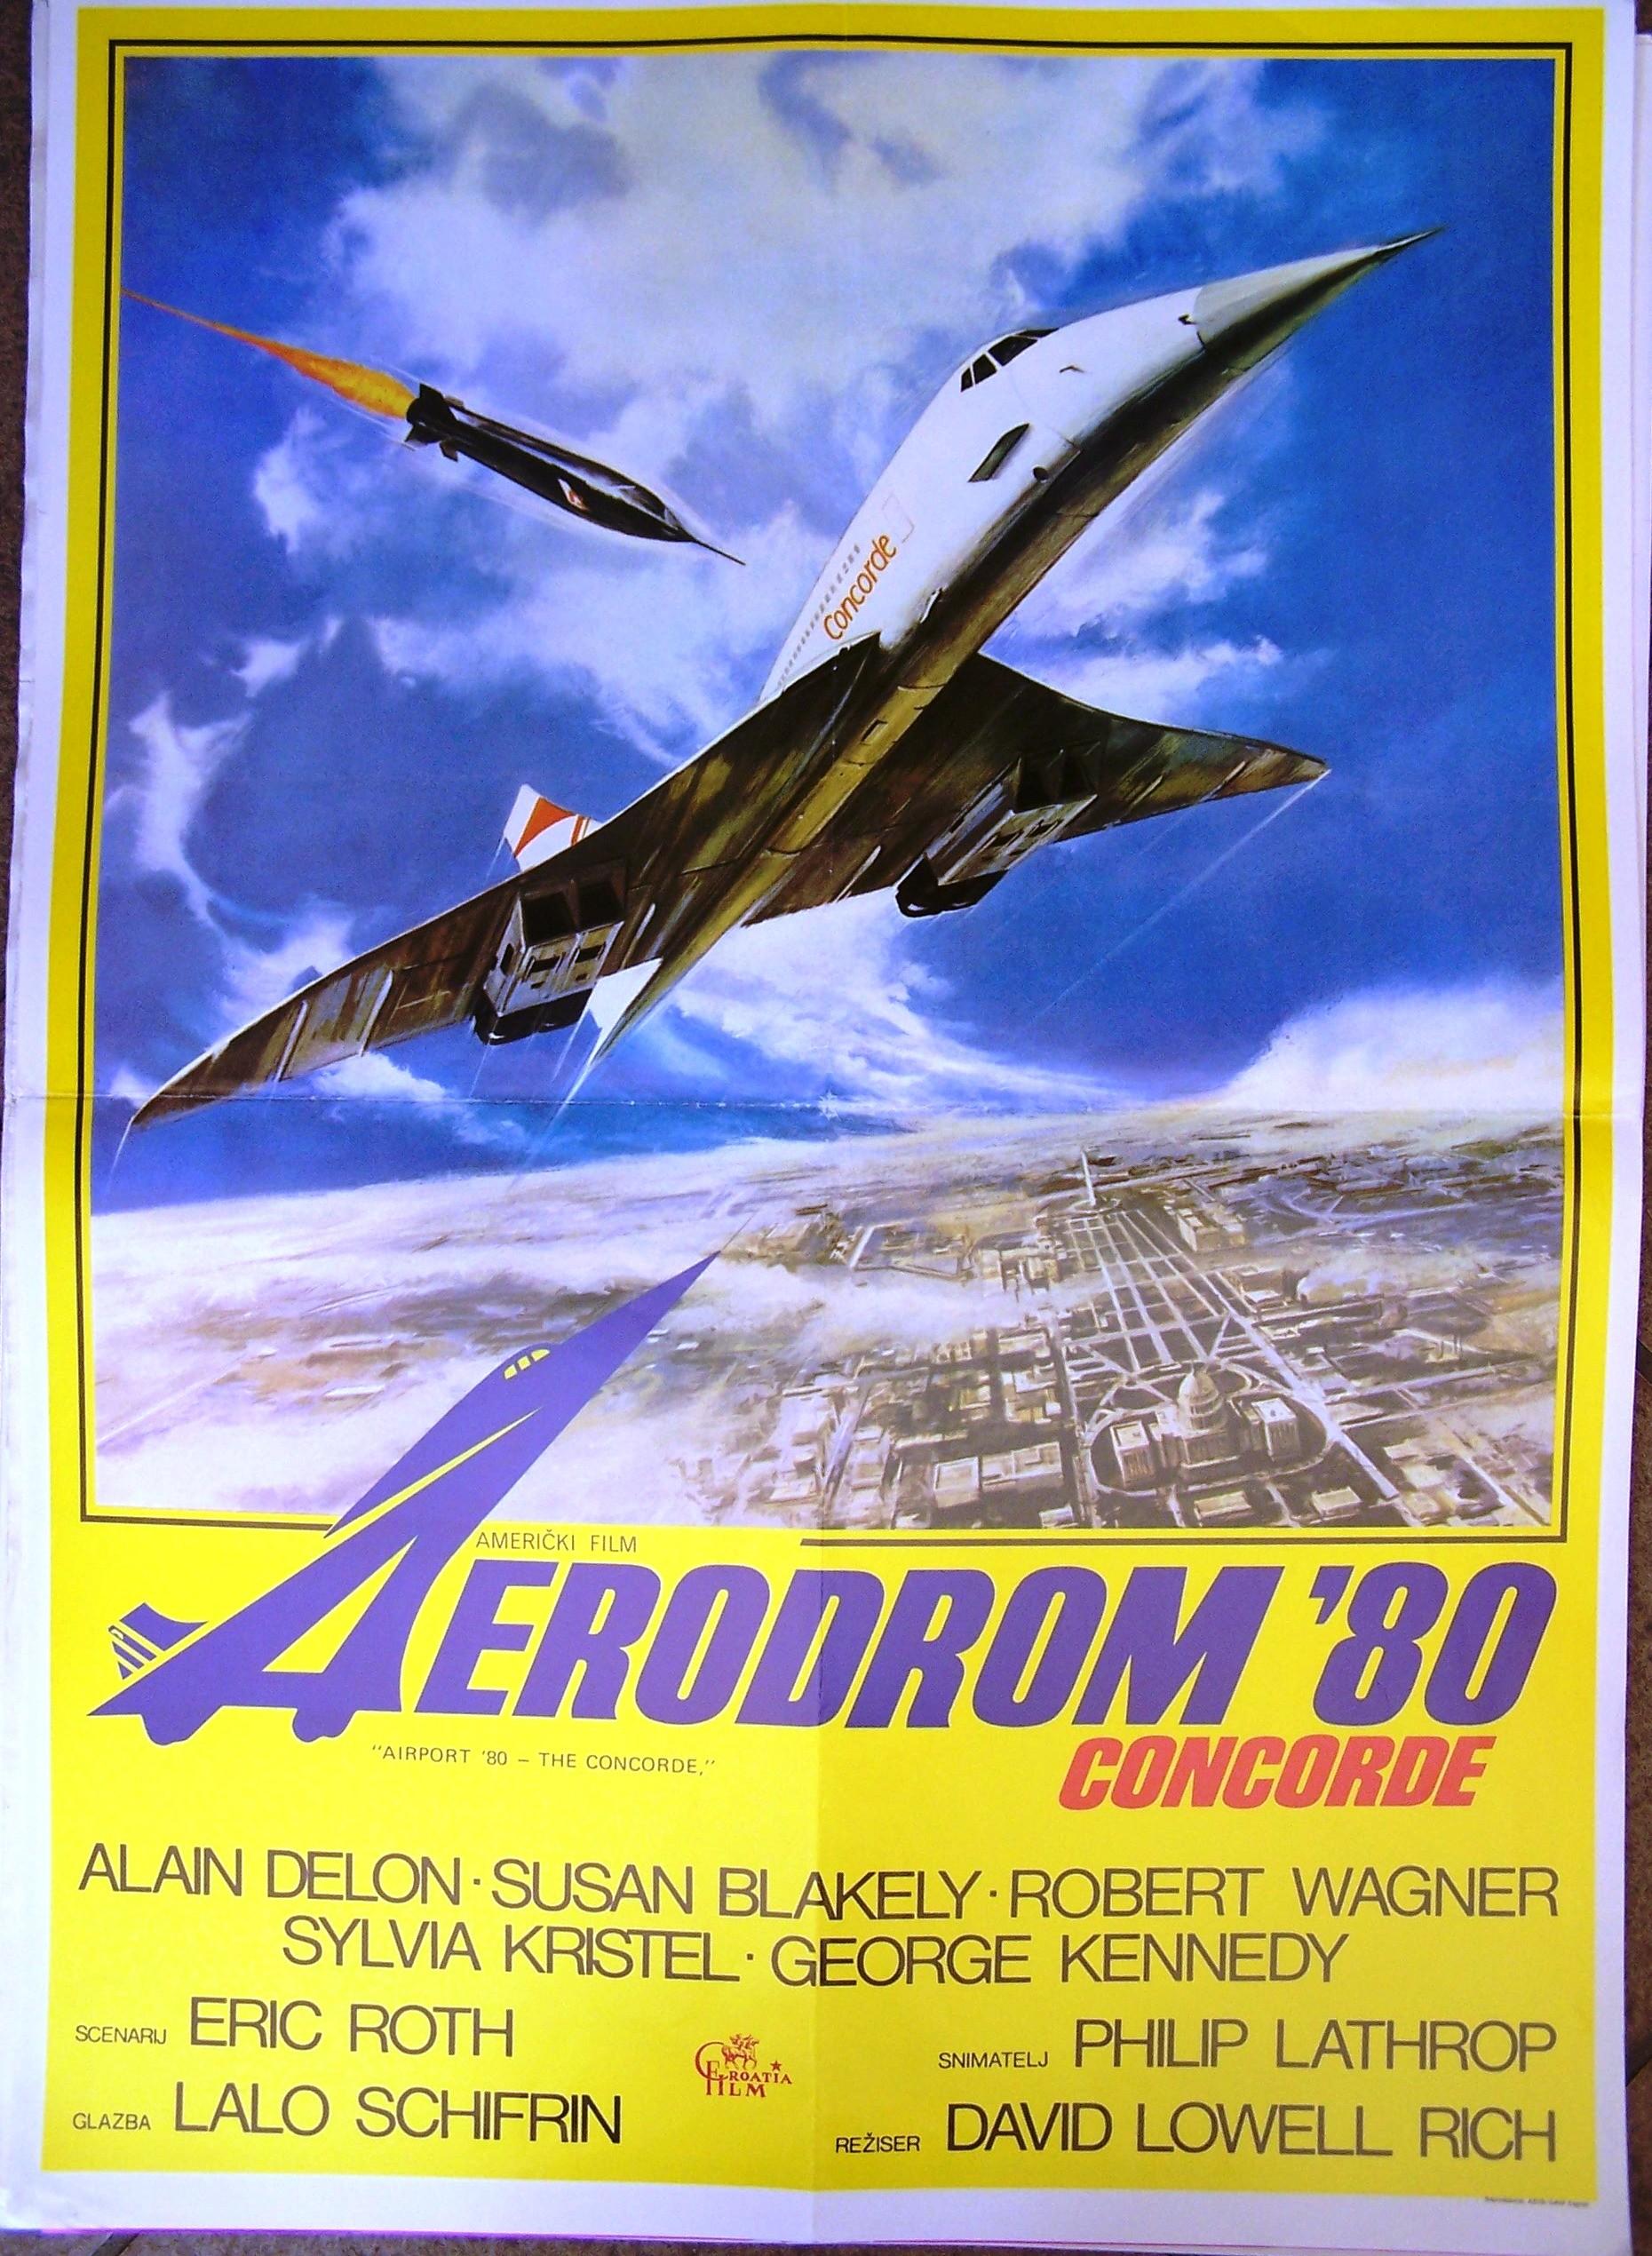 Aerodrom 80 Concorde